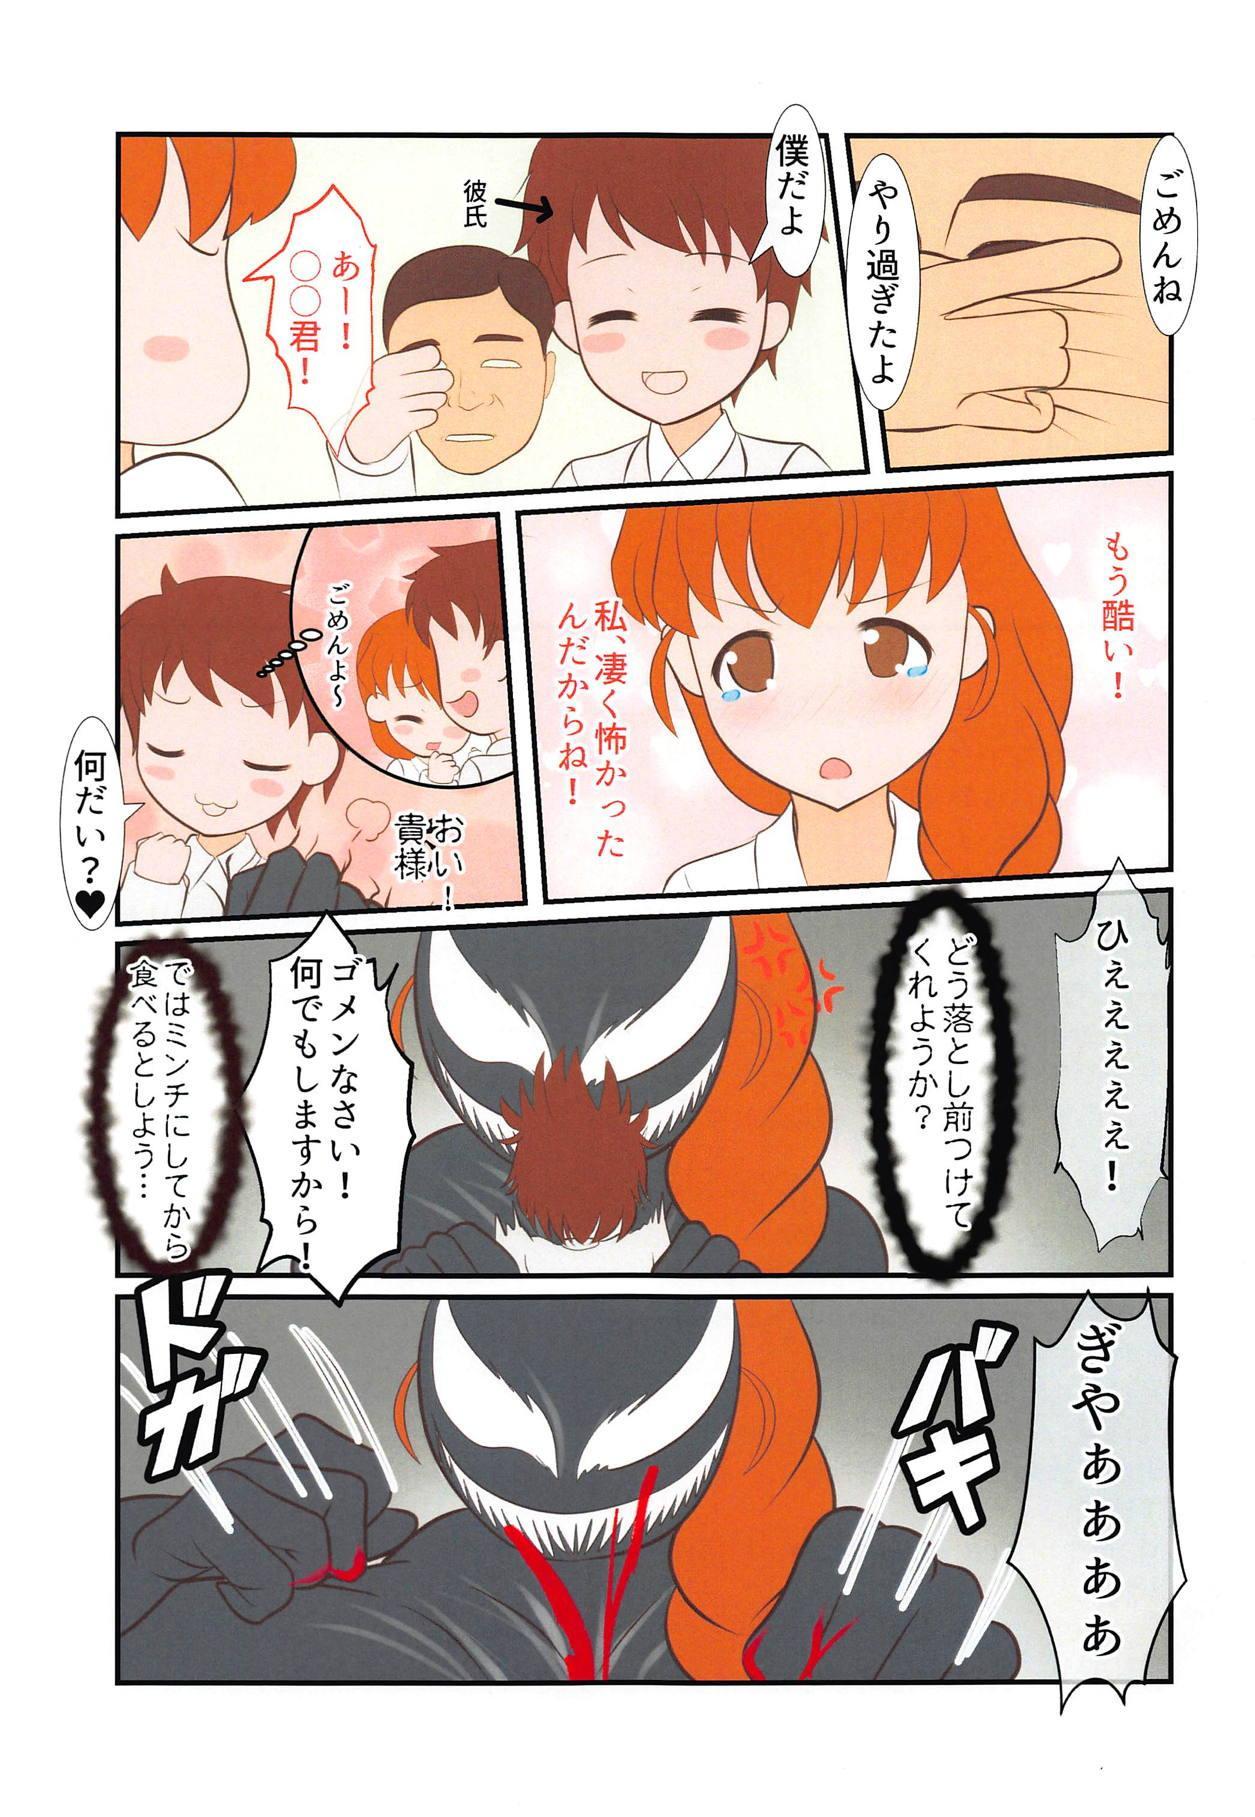 Rukuriri-san no Chikan Higai 15